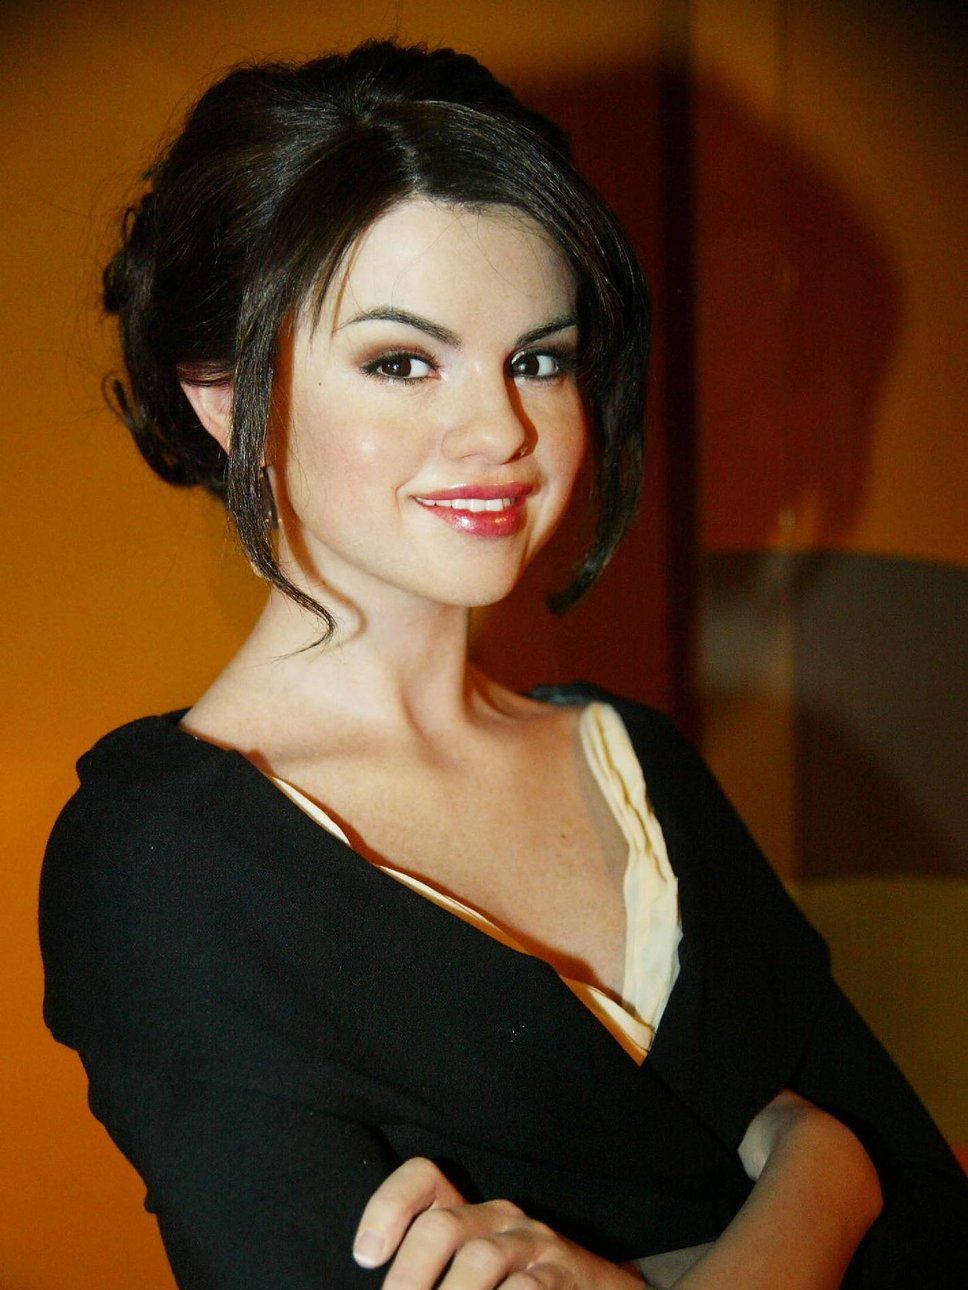 Selena Gomez Sexy Wallpapers  Gotsohot-9358